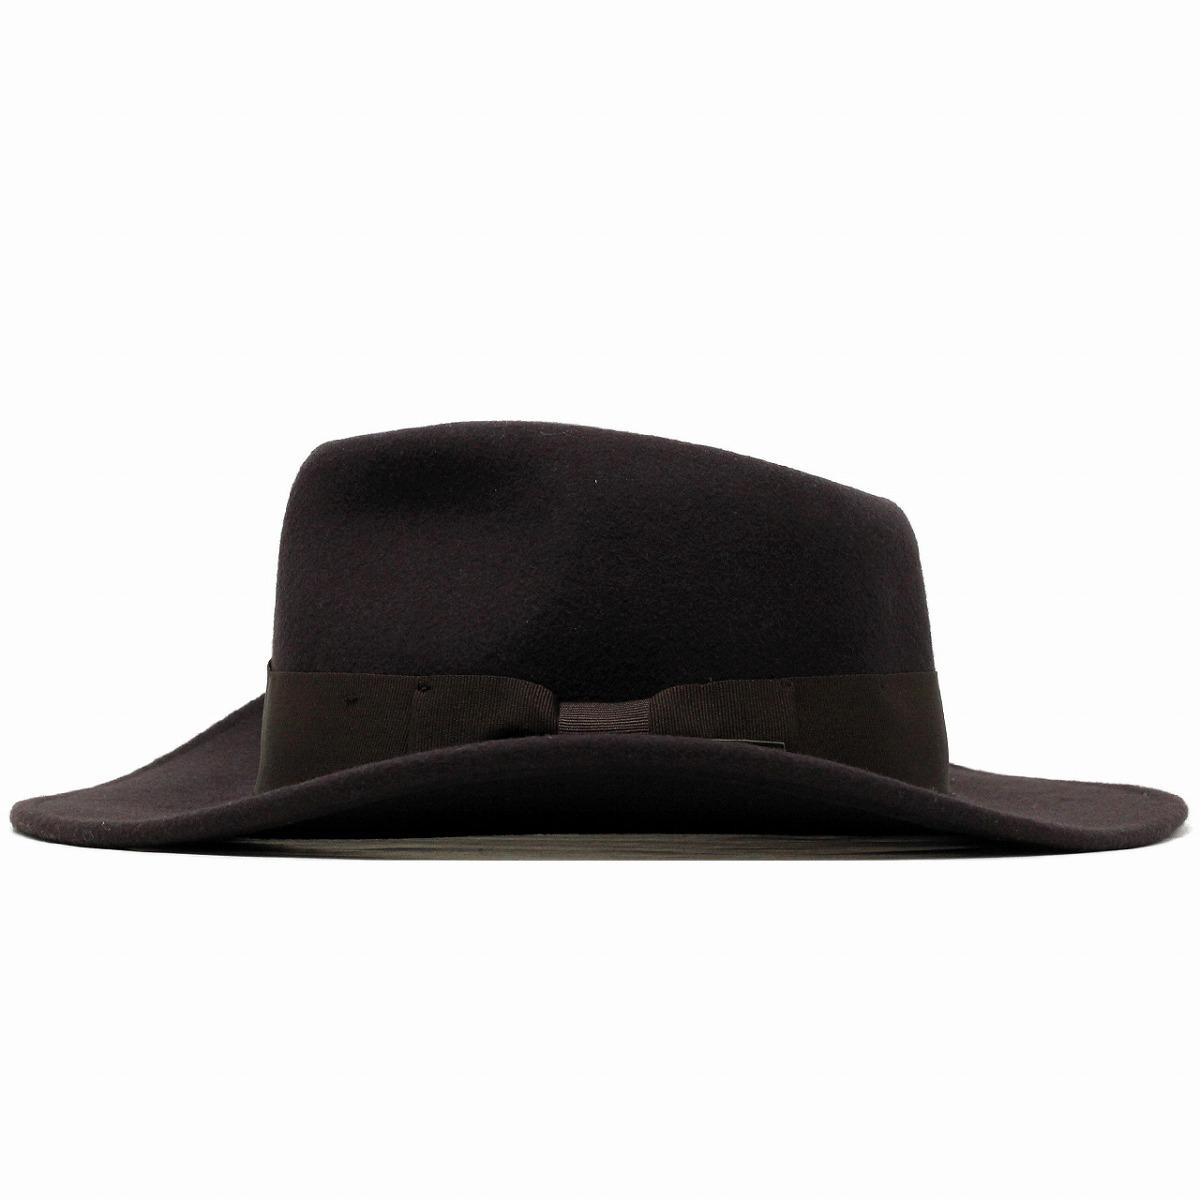 Men/'s 100/% Crush-able Wool Felt  Indiana Jones Cowboy Outback Western Fedora Hat